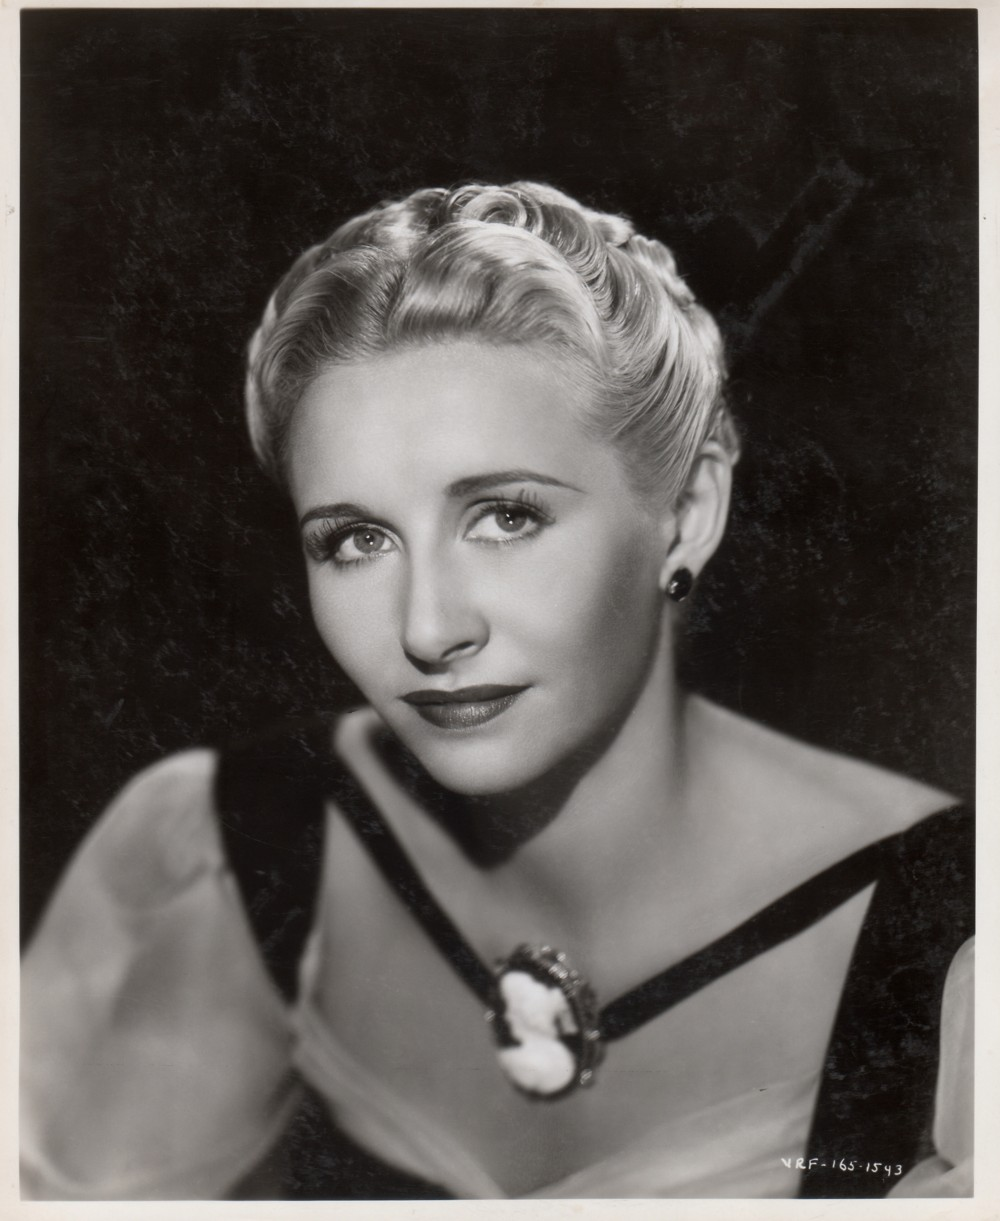 La Femme du Pionnier - Dakota - 1945 Photo825